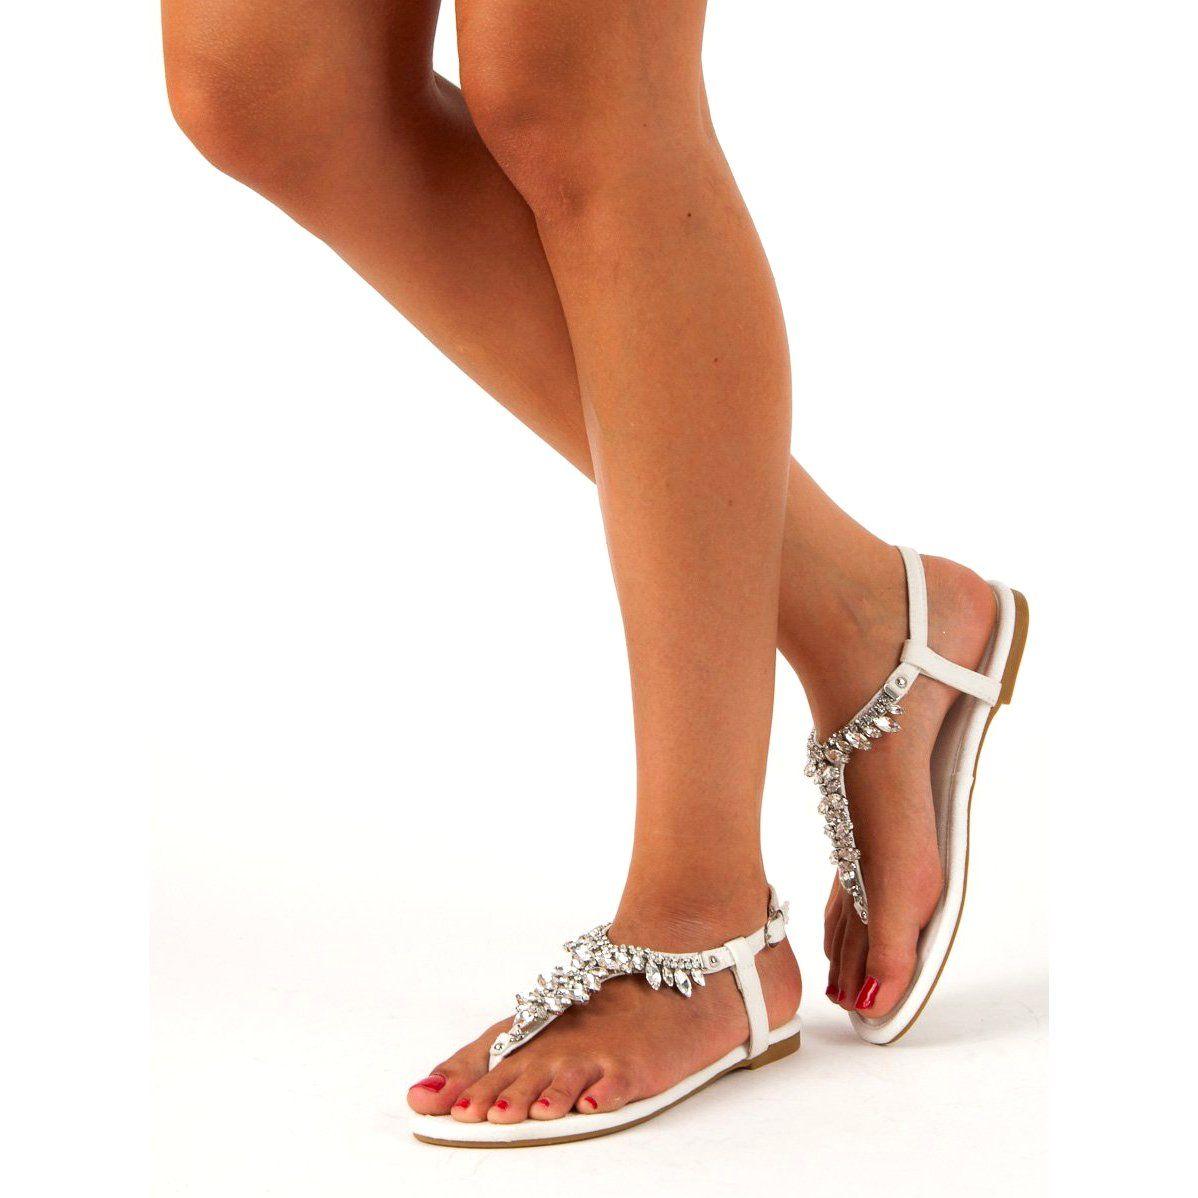 Eleganckie Plaskie Sandaly Vices Biale Shoes Sandals Fashion